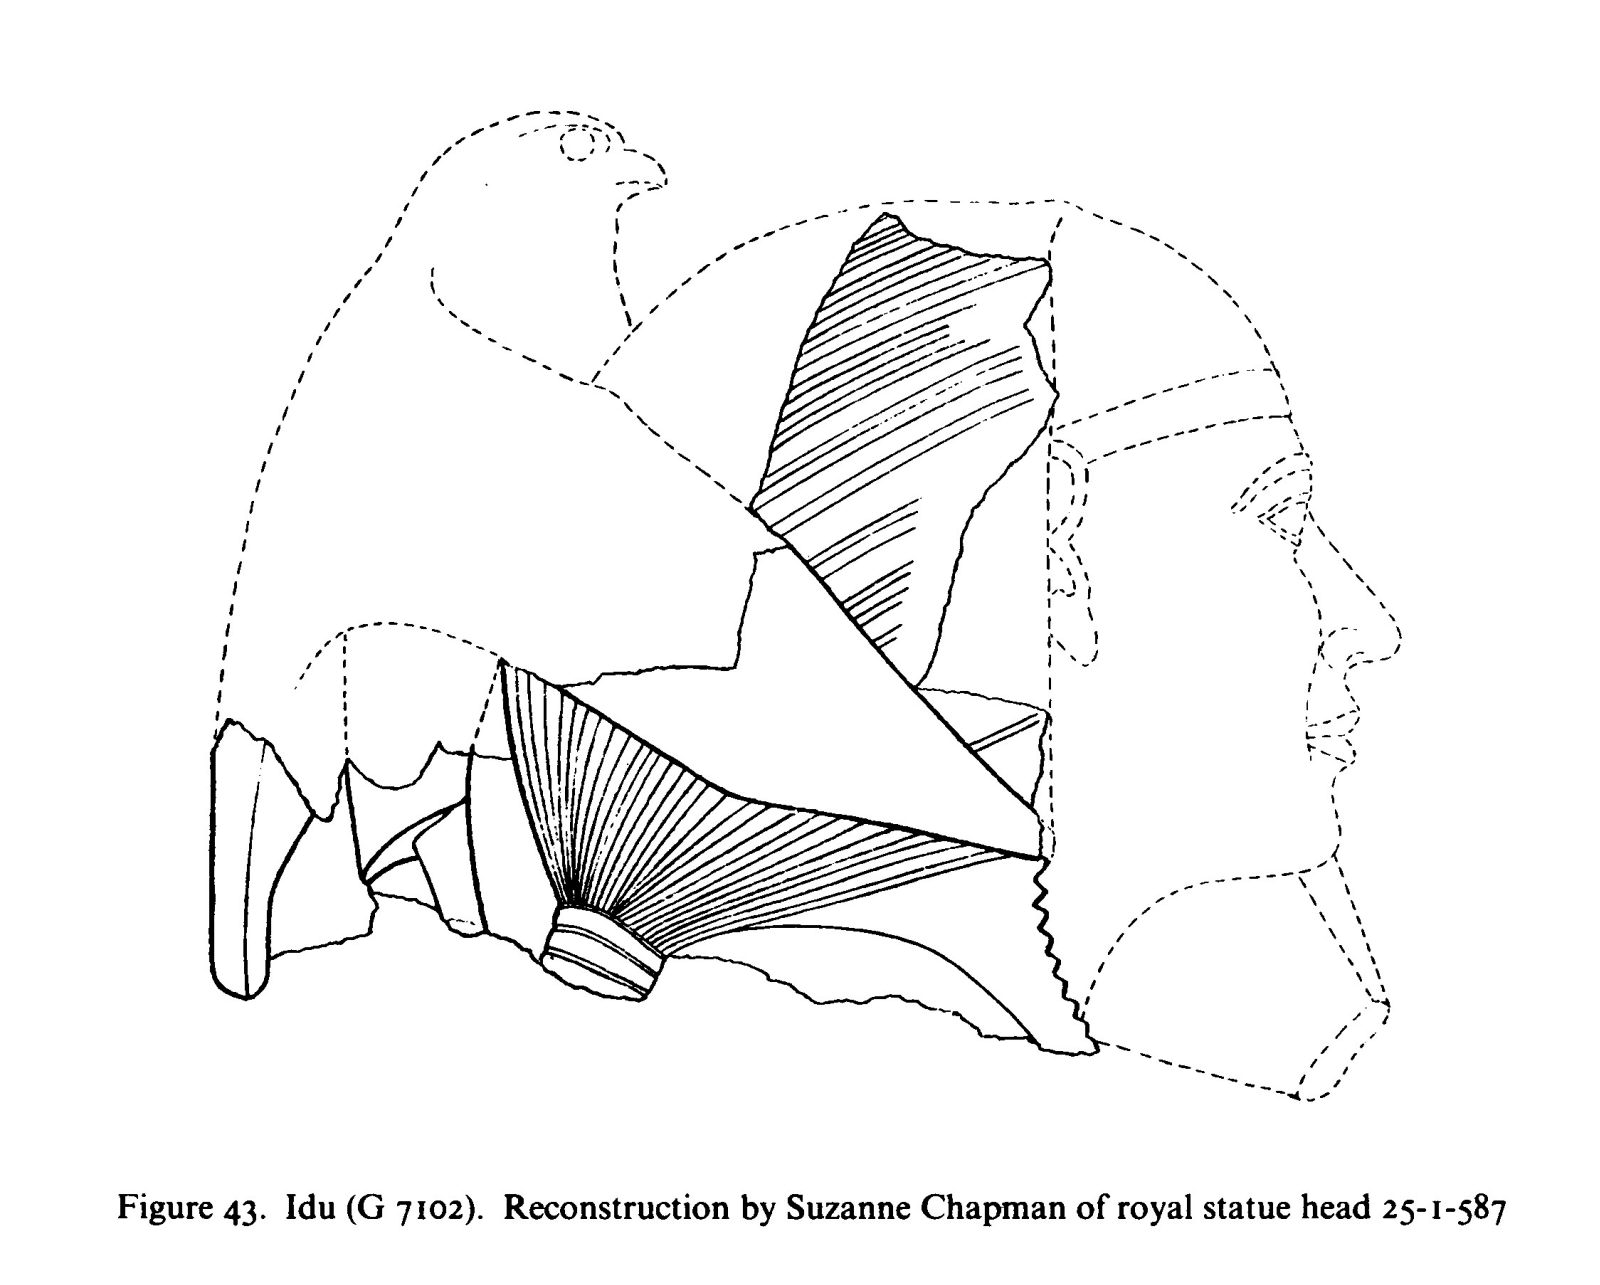 Drawings: G 7102: royal statue head